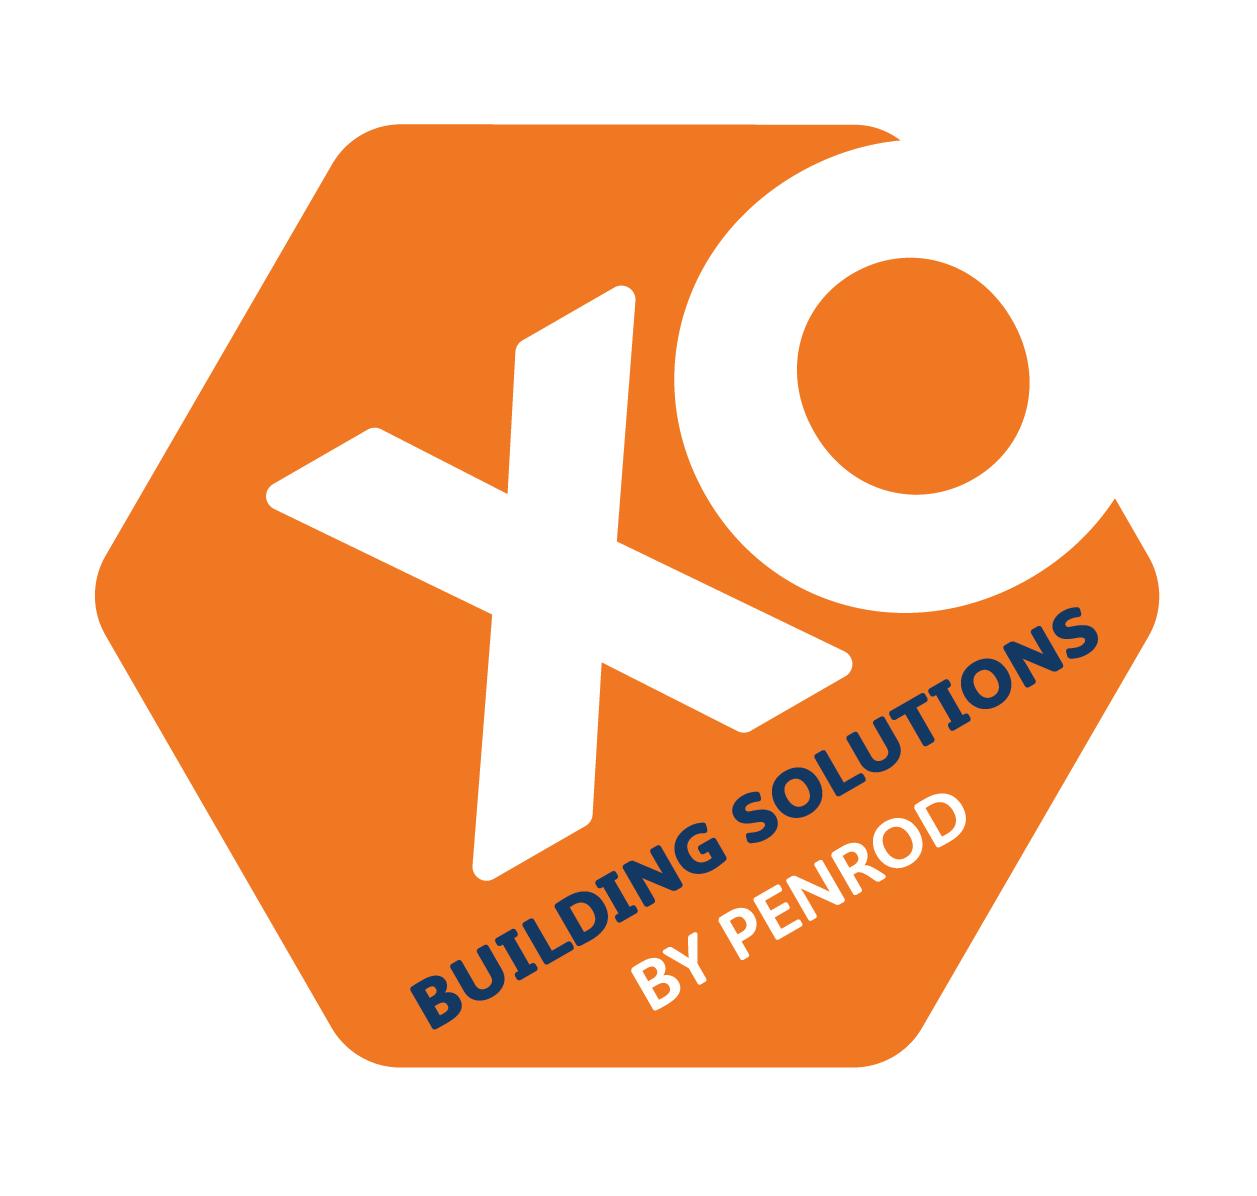 XO by Penrod